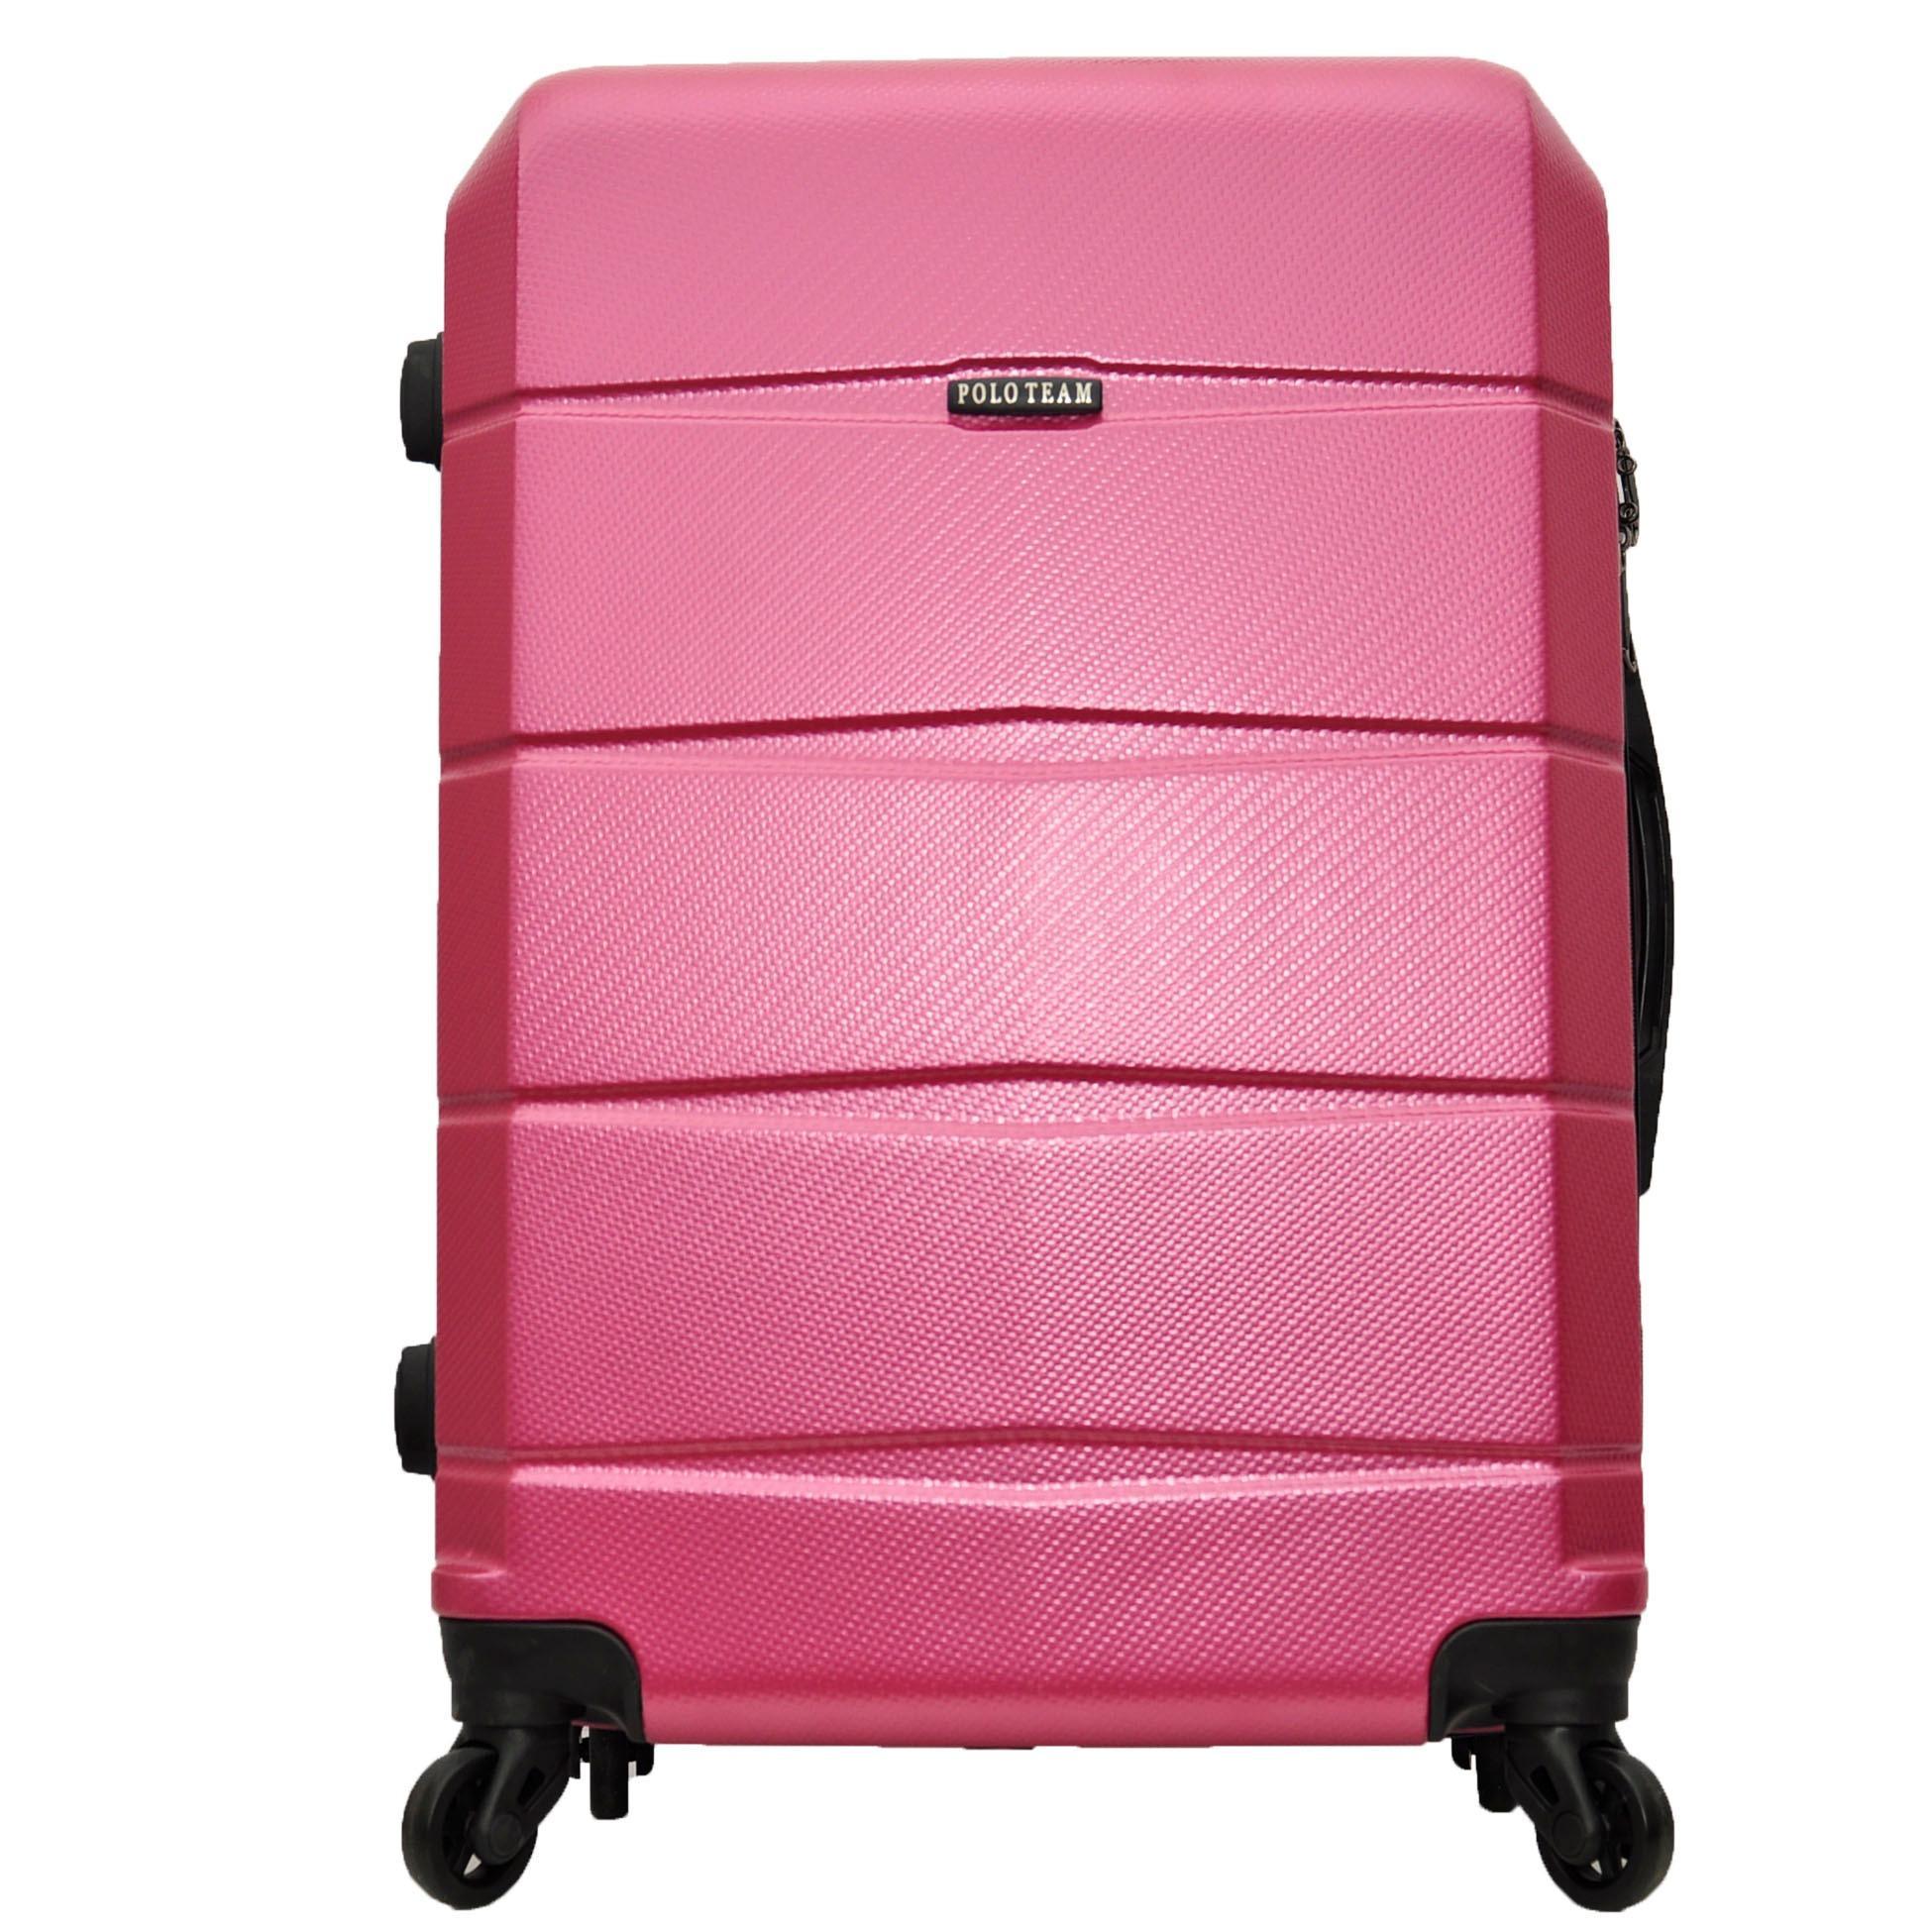 Produk Promo Koper Polo Expley Hardcase Luggage 20 Inchi 6601 Tas Design 4 Roda Putar Team Kabin Size Inch 301